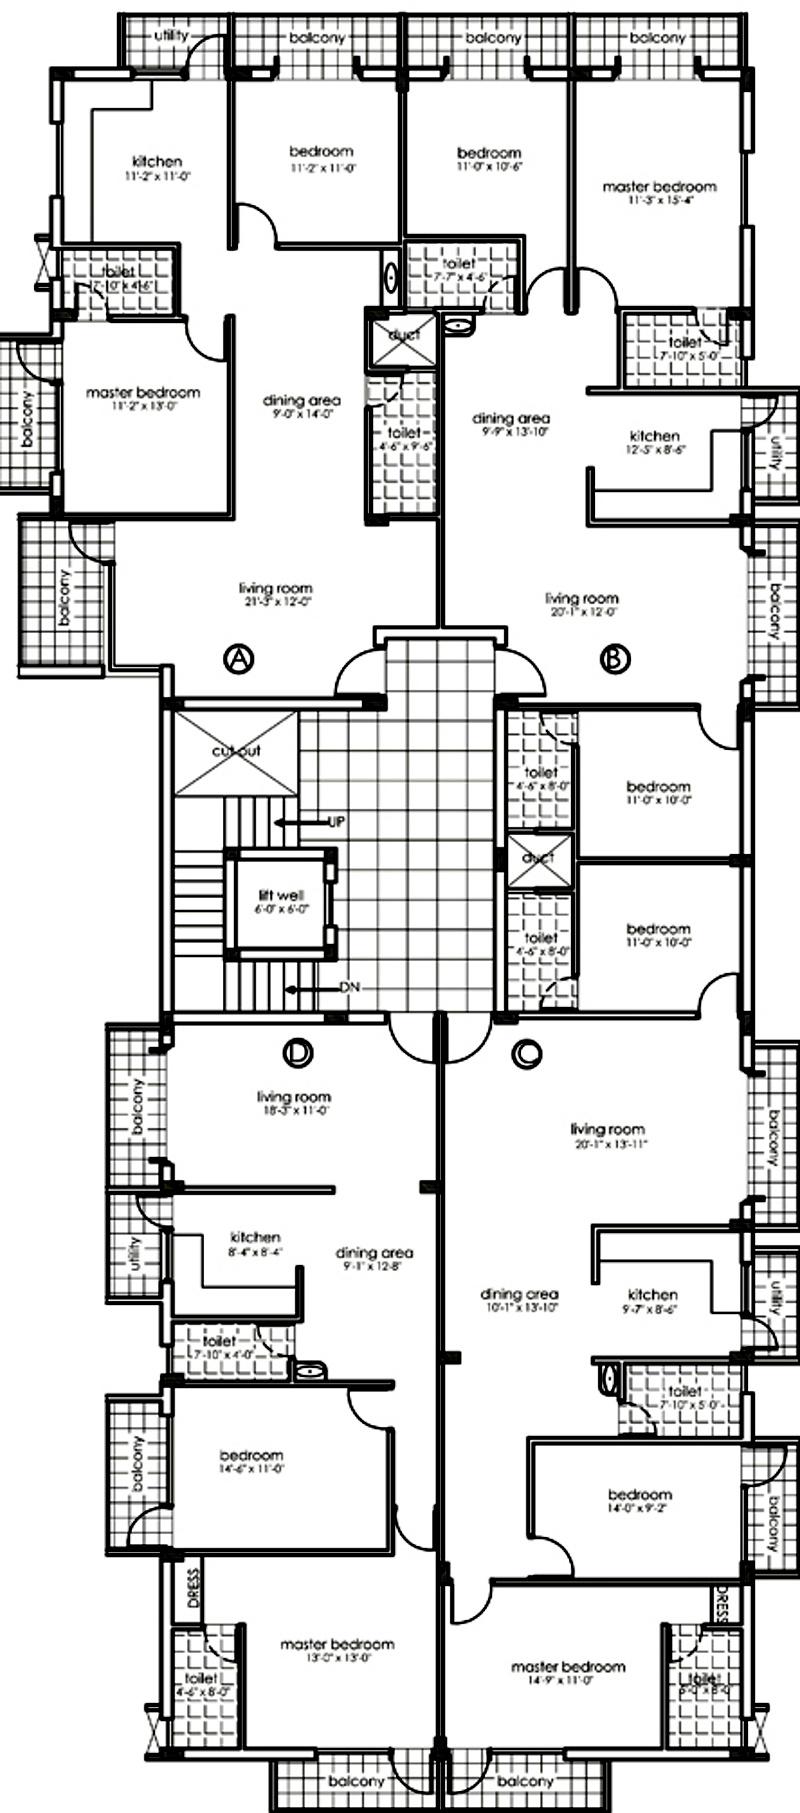 conseptz mercury mercury cluster plan for typical floor 762152?width\=520\&height\=400 paras homes floor plans gurus floor,Paras Homes Floor Plans